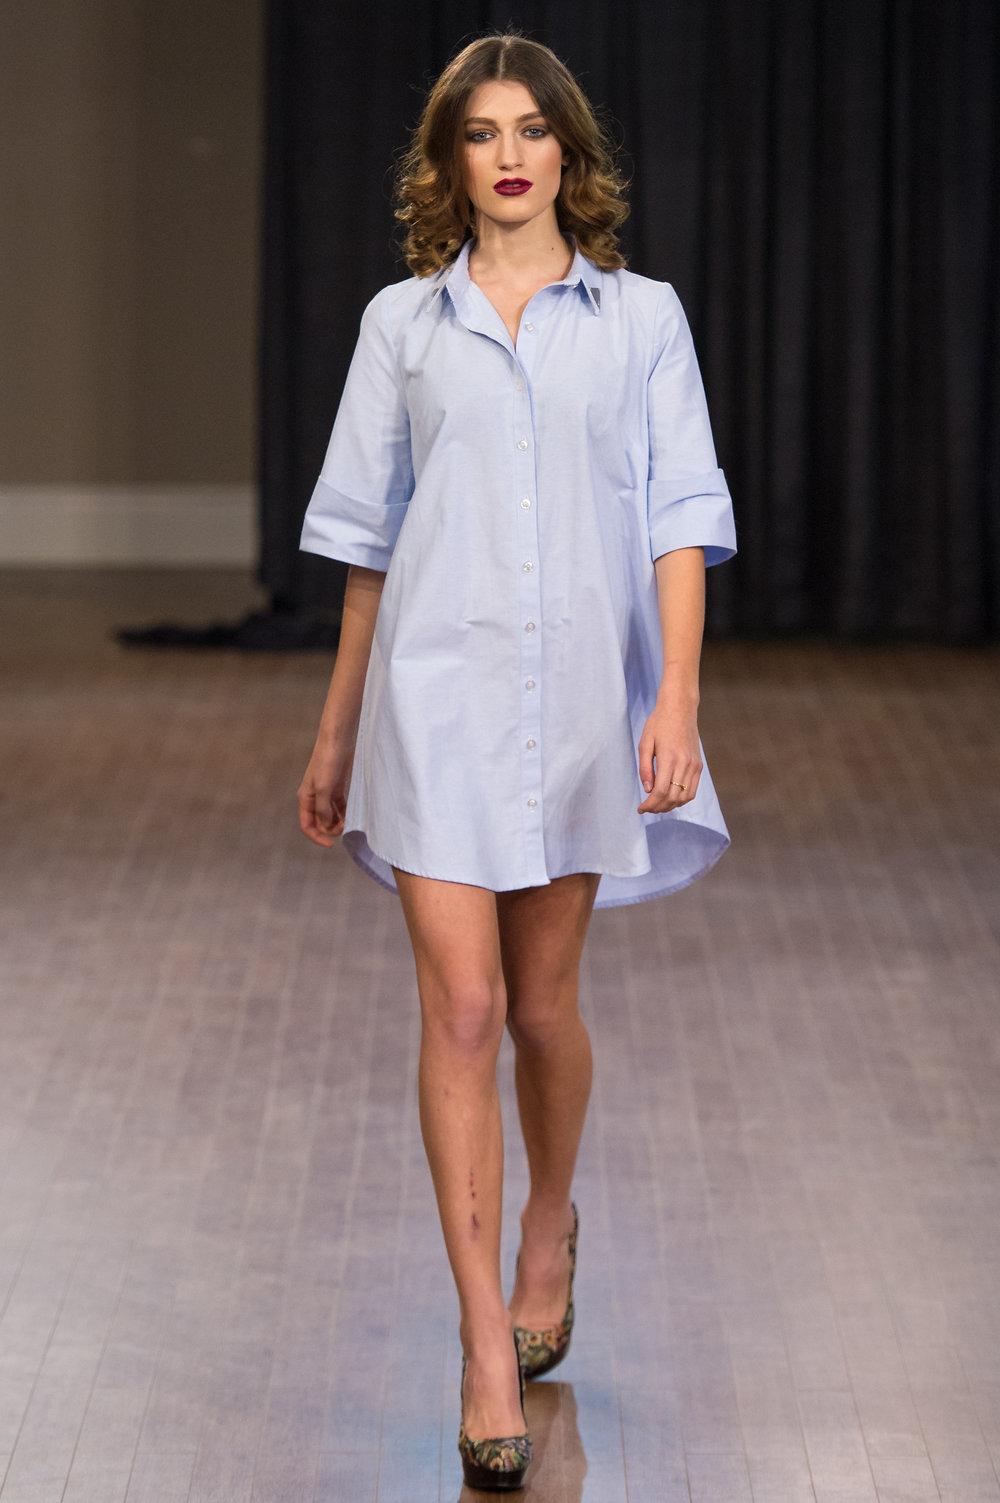 Look 02 -   Button Up Shirt Dress   Available Sizes:   XS/S   M/L   Available Colours:   White ( 97% Cotton / 3% Spandex)   Blue (100% Cotton)SOLD OUT